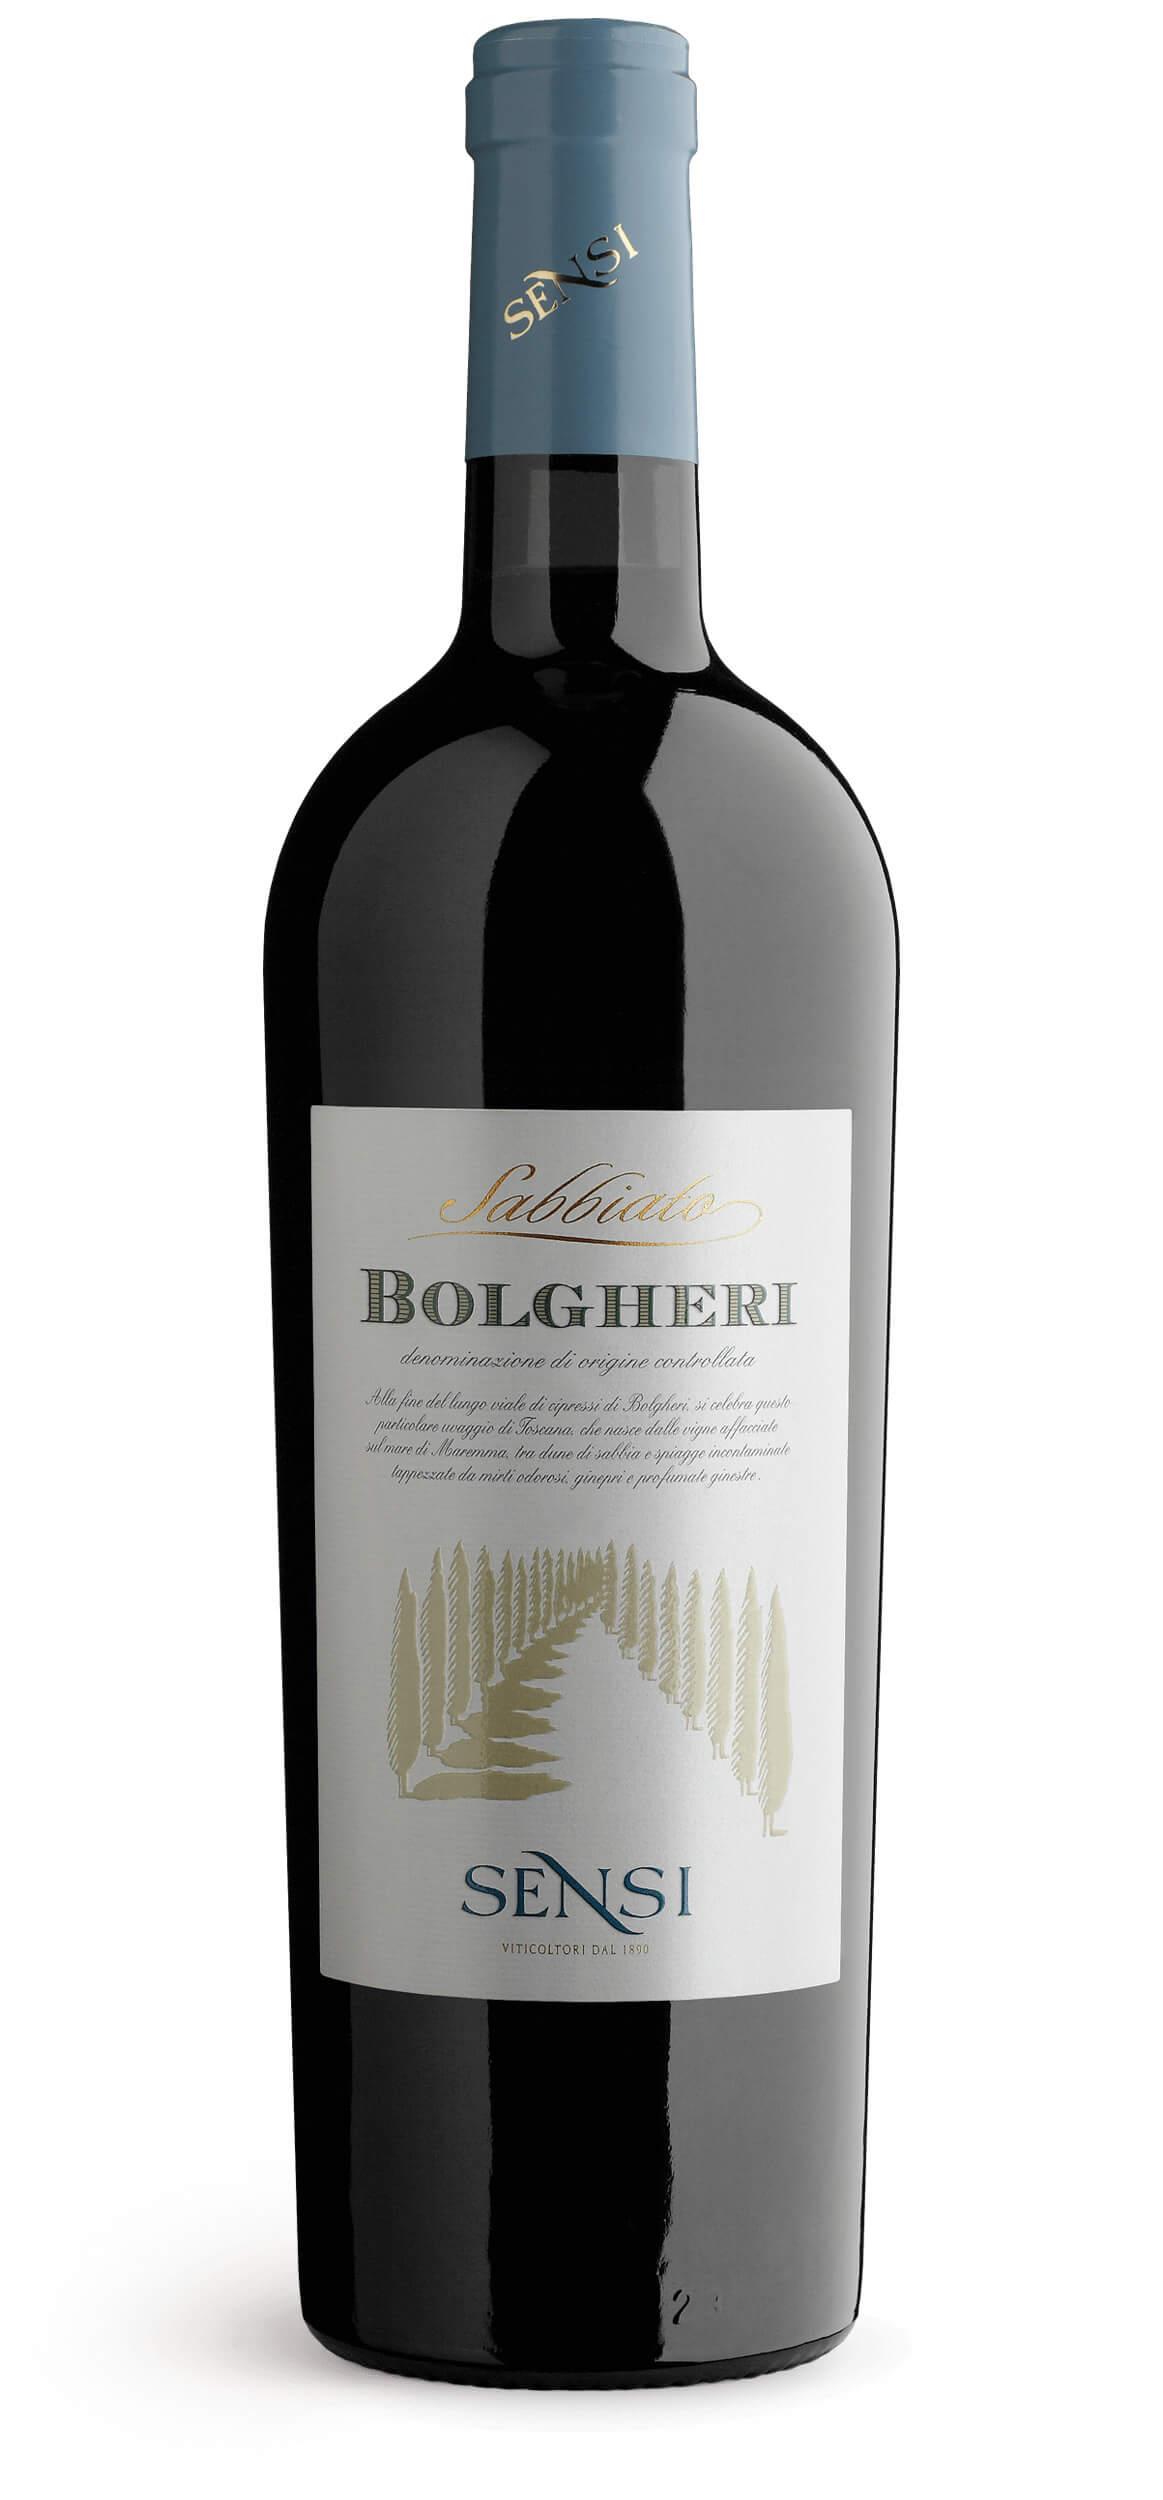 Sensi Classica Bolgheri